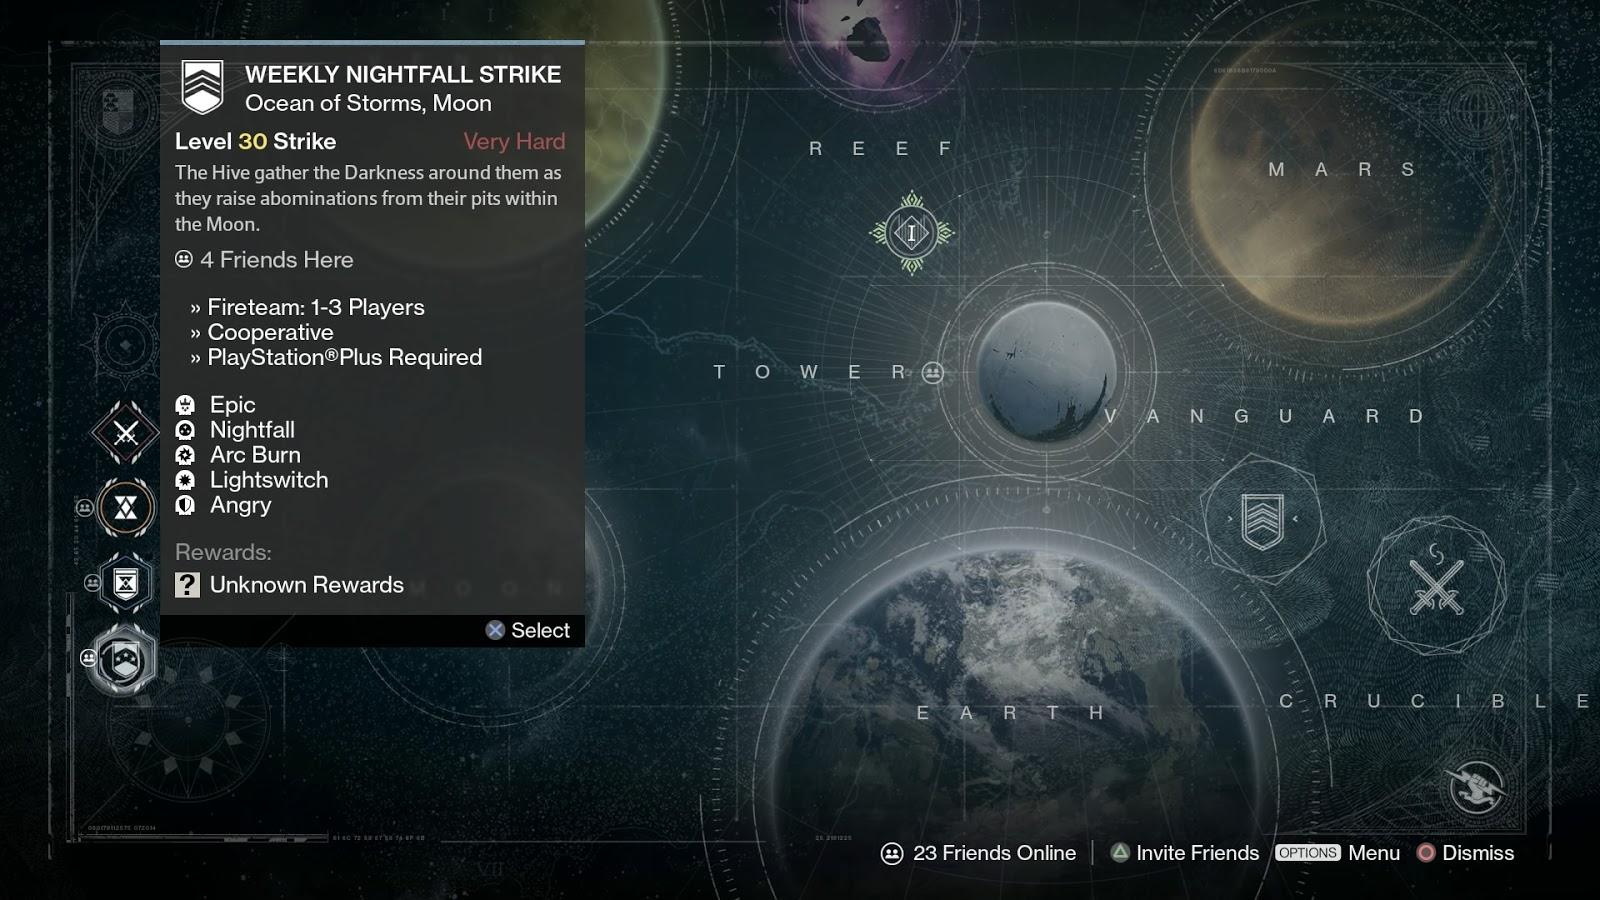 Destiny Weekly Reset Nightfall / Heroic - 21 january (1/21